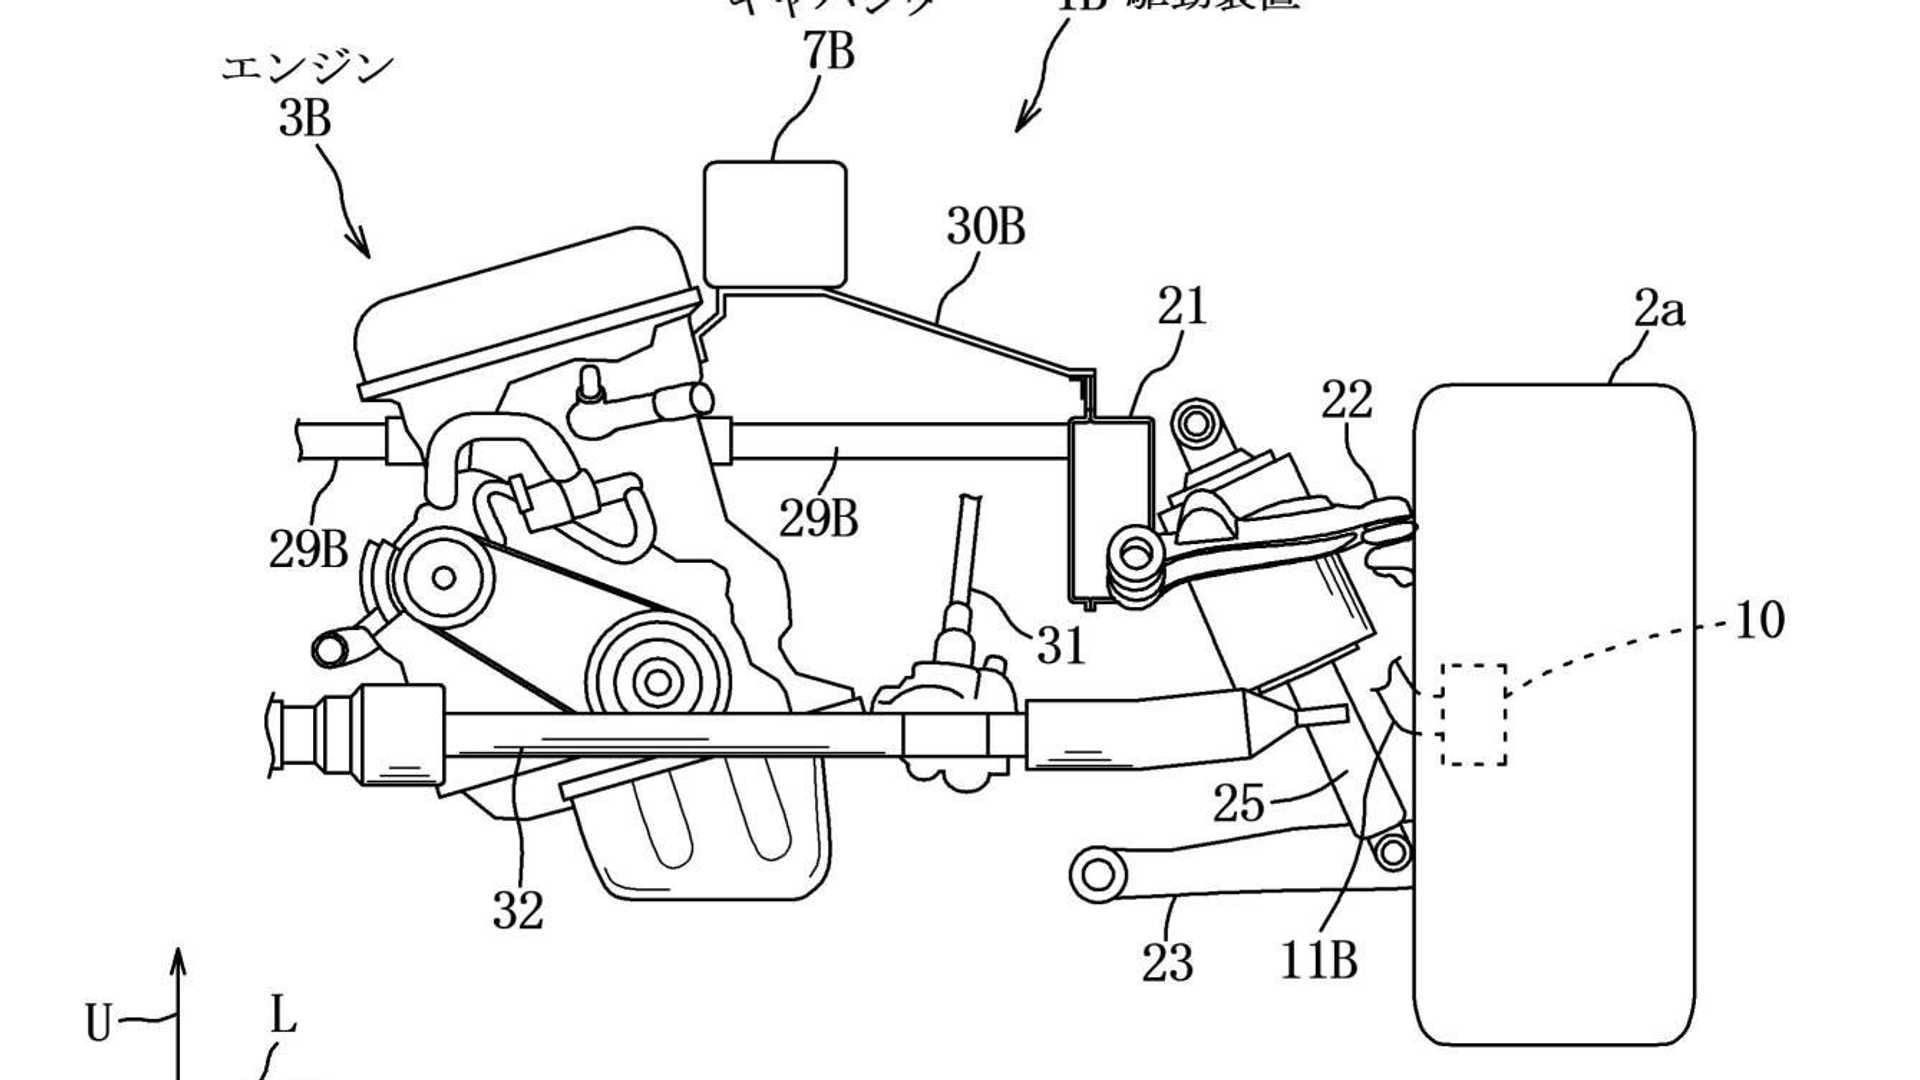 Mazda-Rotary-Engine-Hybrid-Patent-9